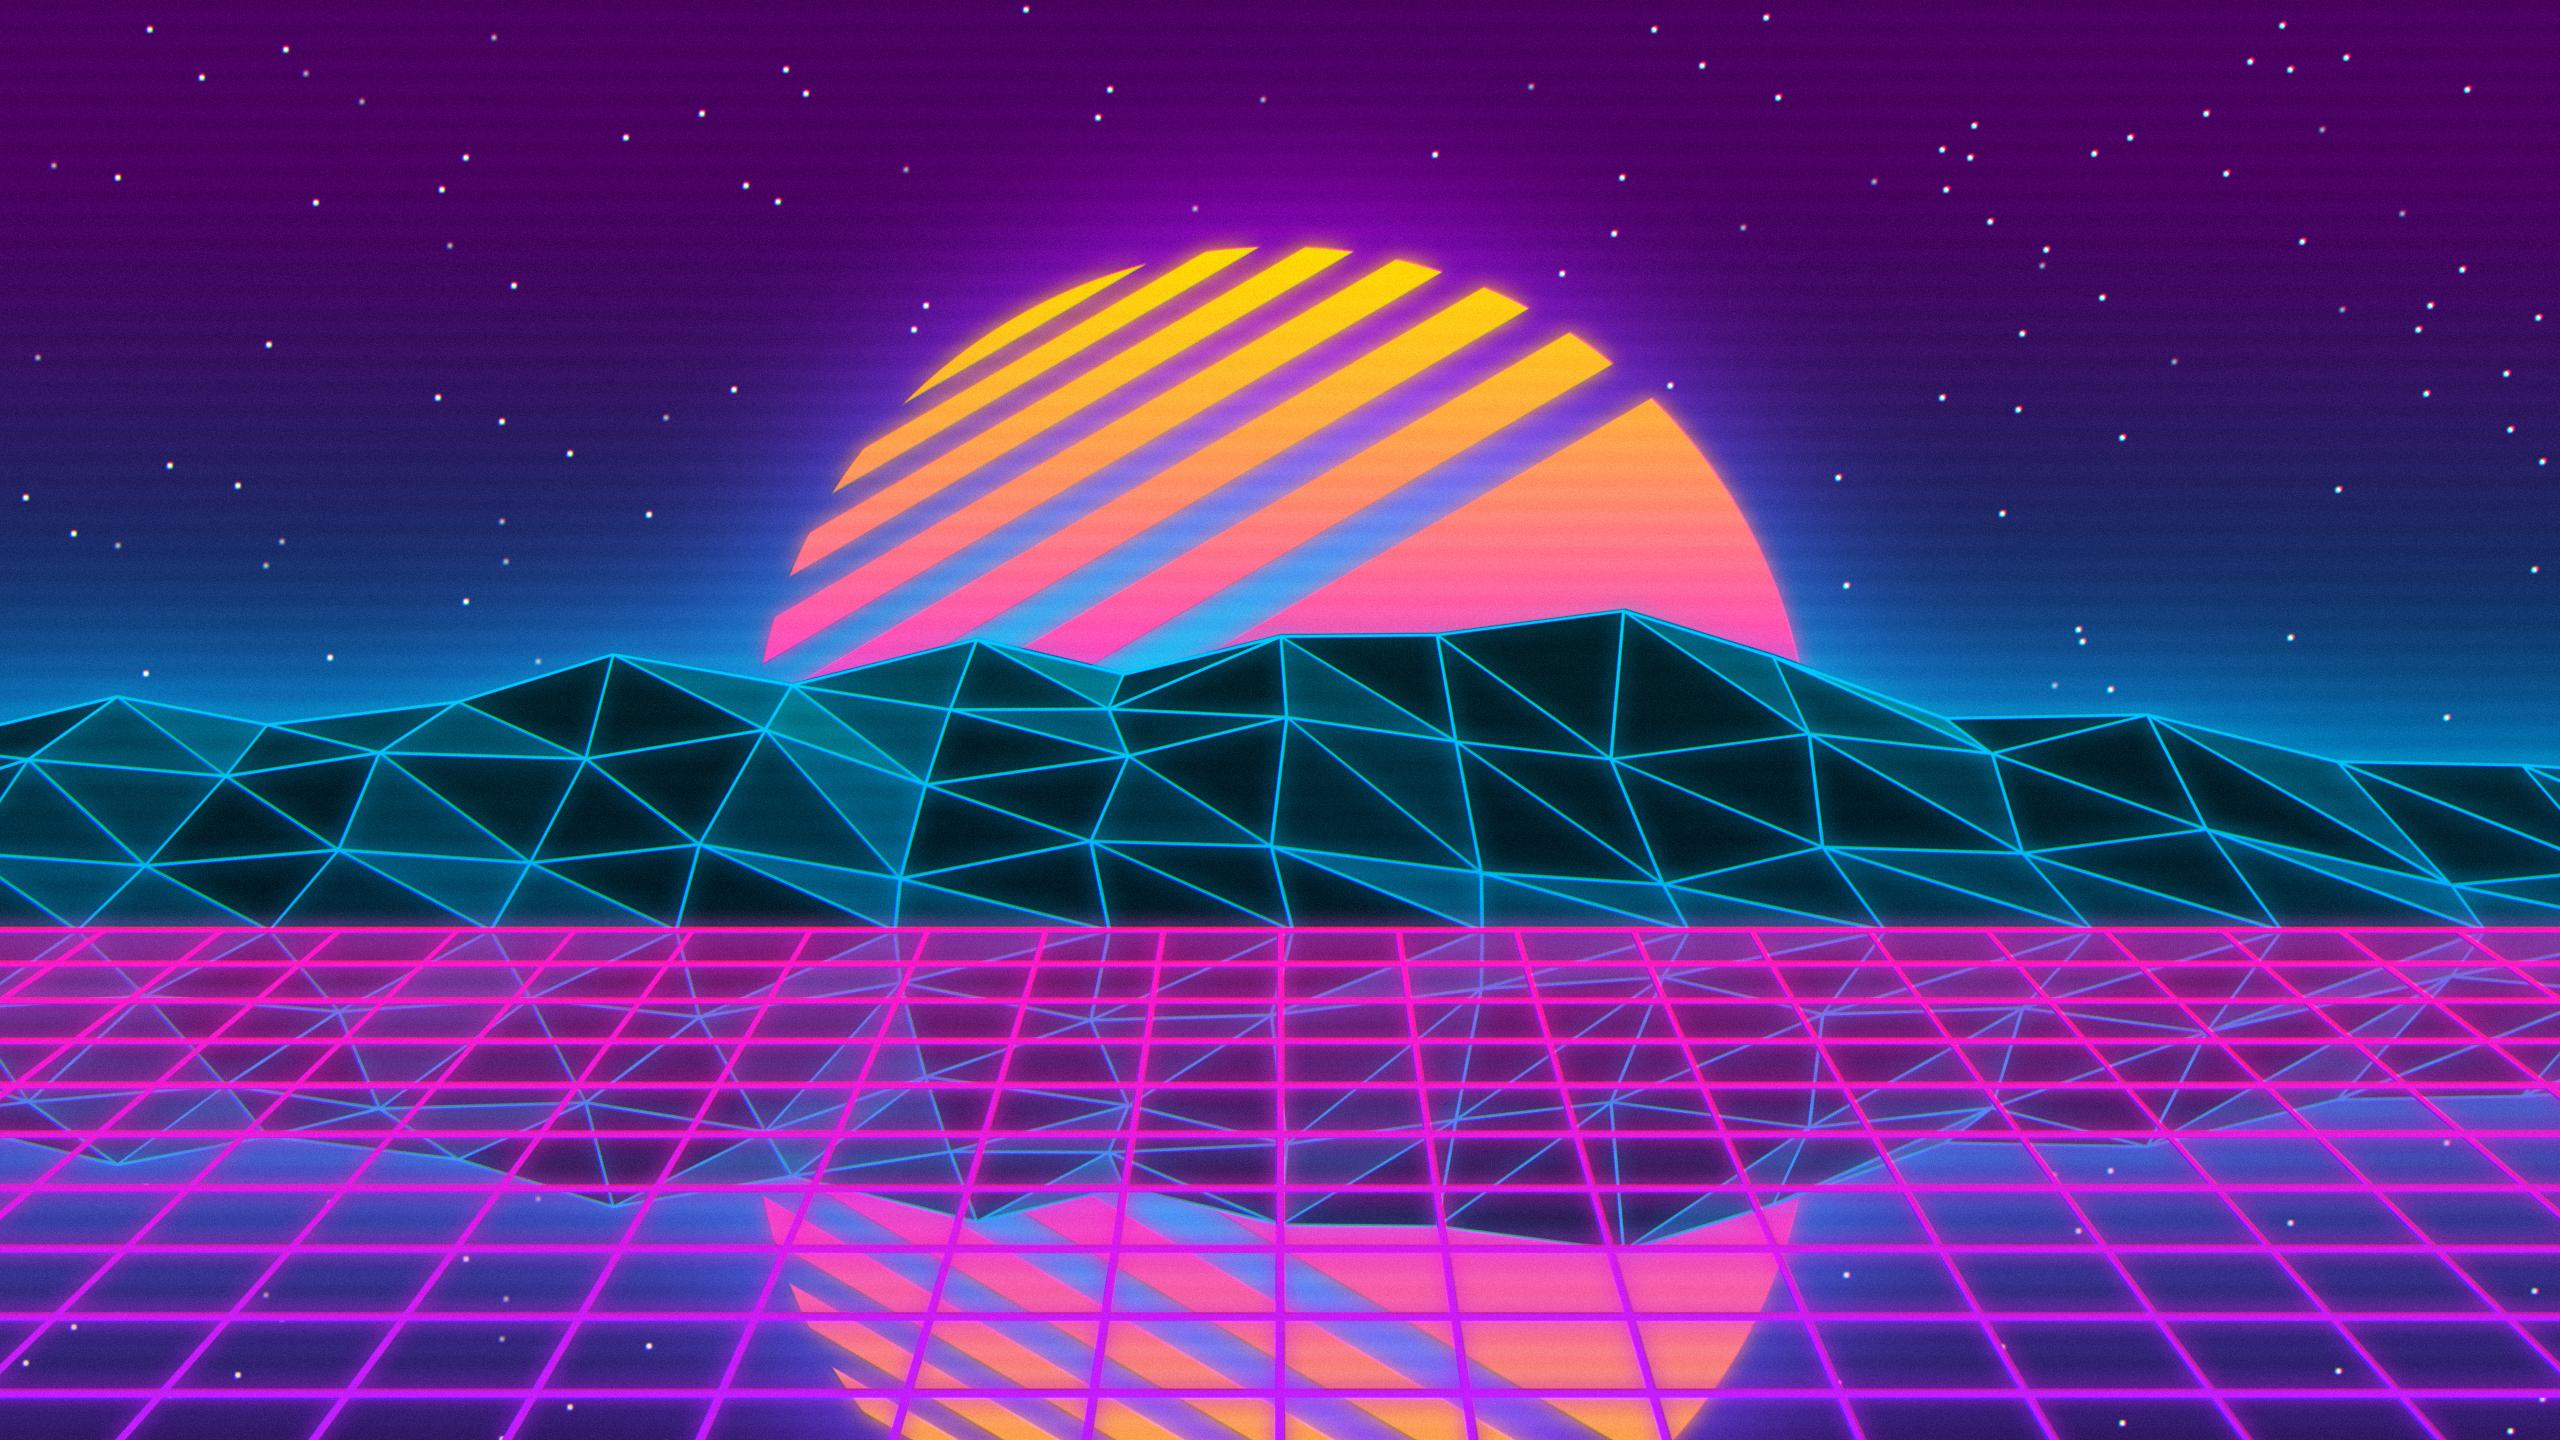 Vaporwave style wallpaper [25601440] wallpapers 2560x1440